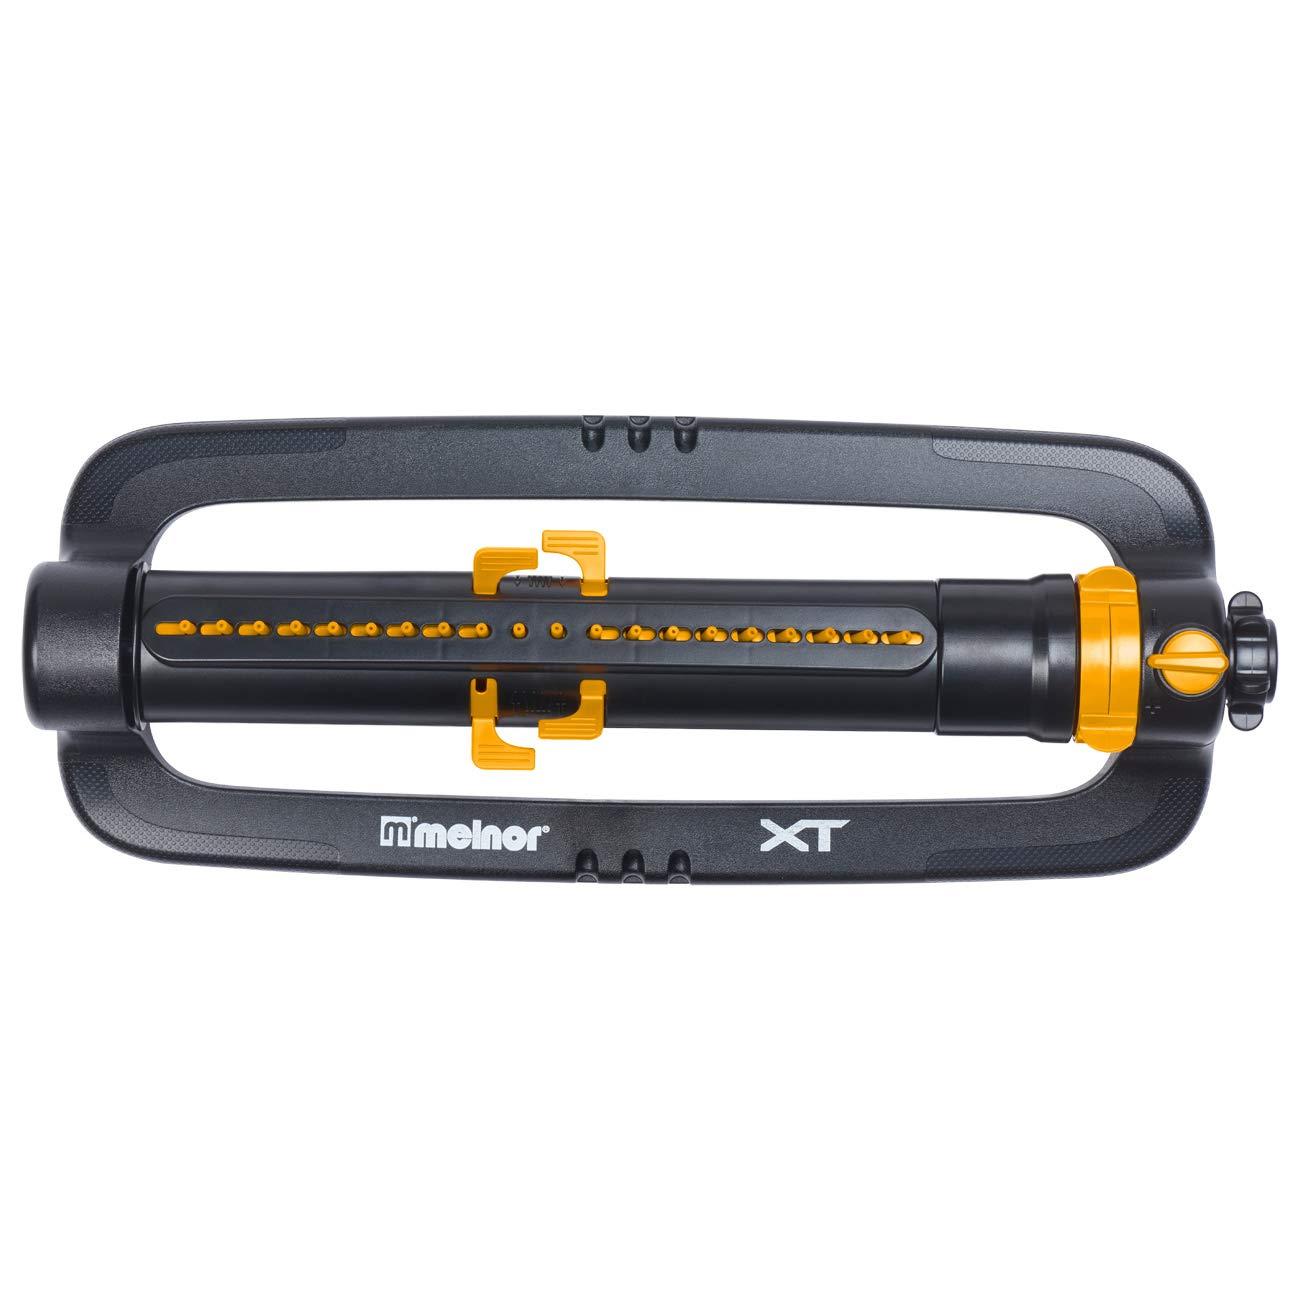 Bundle Melnor 65056-AMZ XT Turbo Oscillator with Range Adjustment and QuickConnect Product Adapter Set